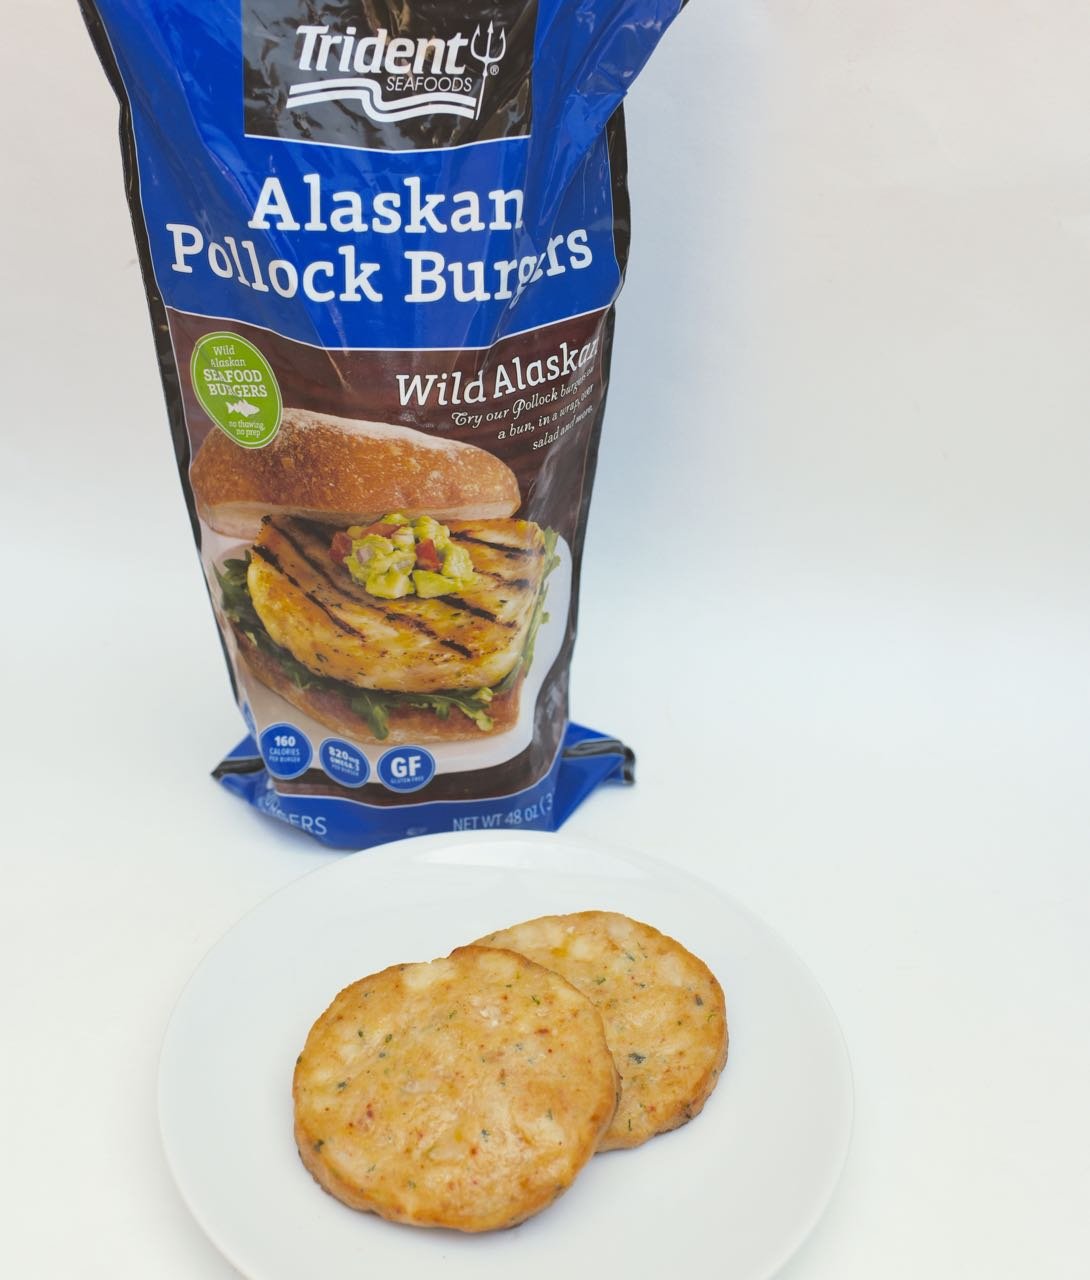 Fish Taco Sauce Recipe for Trident Alaskan Pollock Burgers